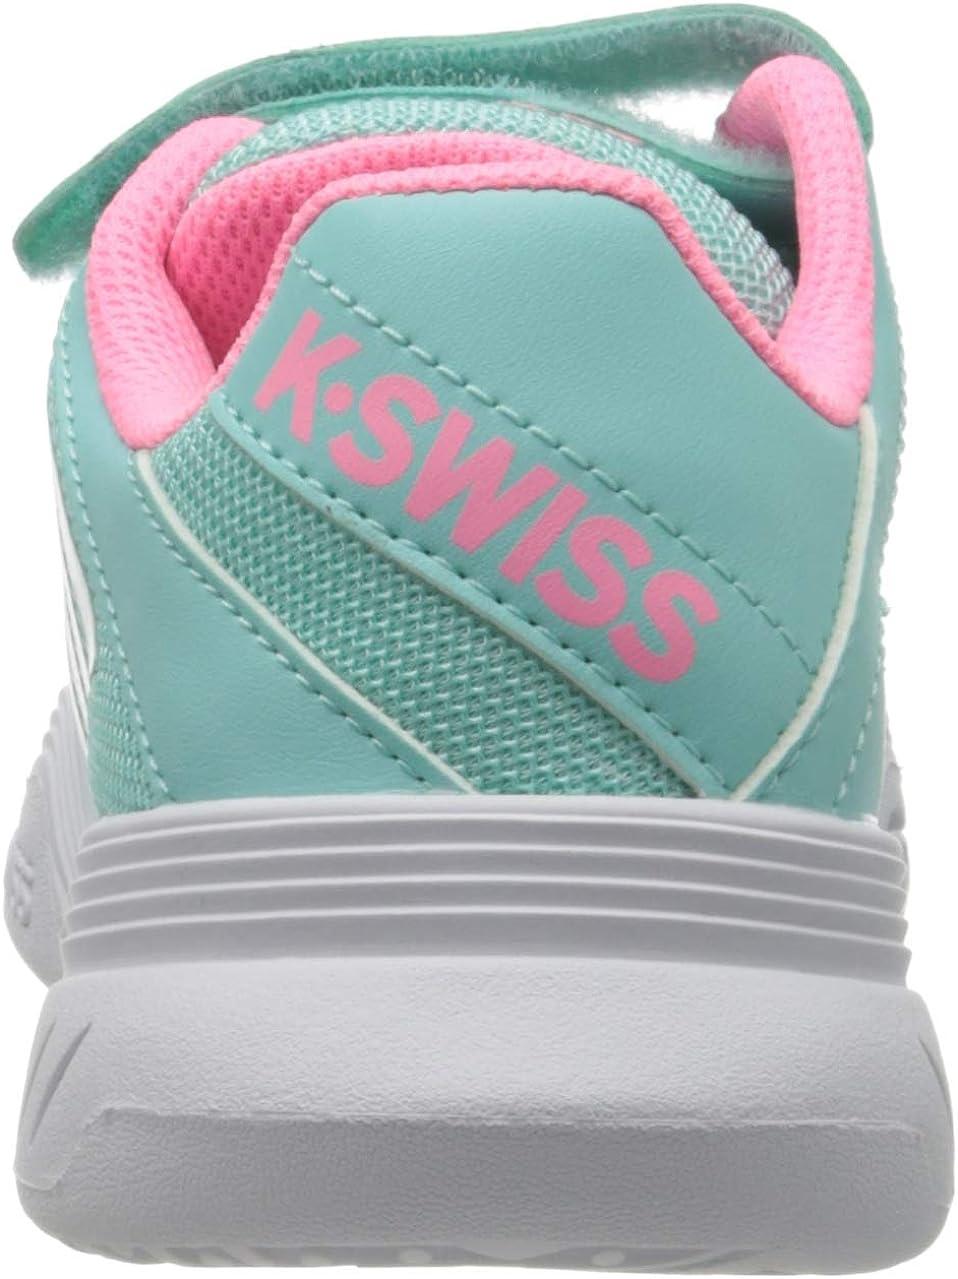 K-Swiss Performance Court Express Strap Omni Zapatillas de Tenis Unisex ni/ños